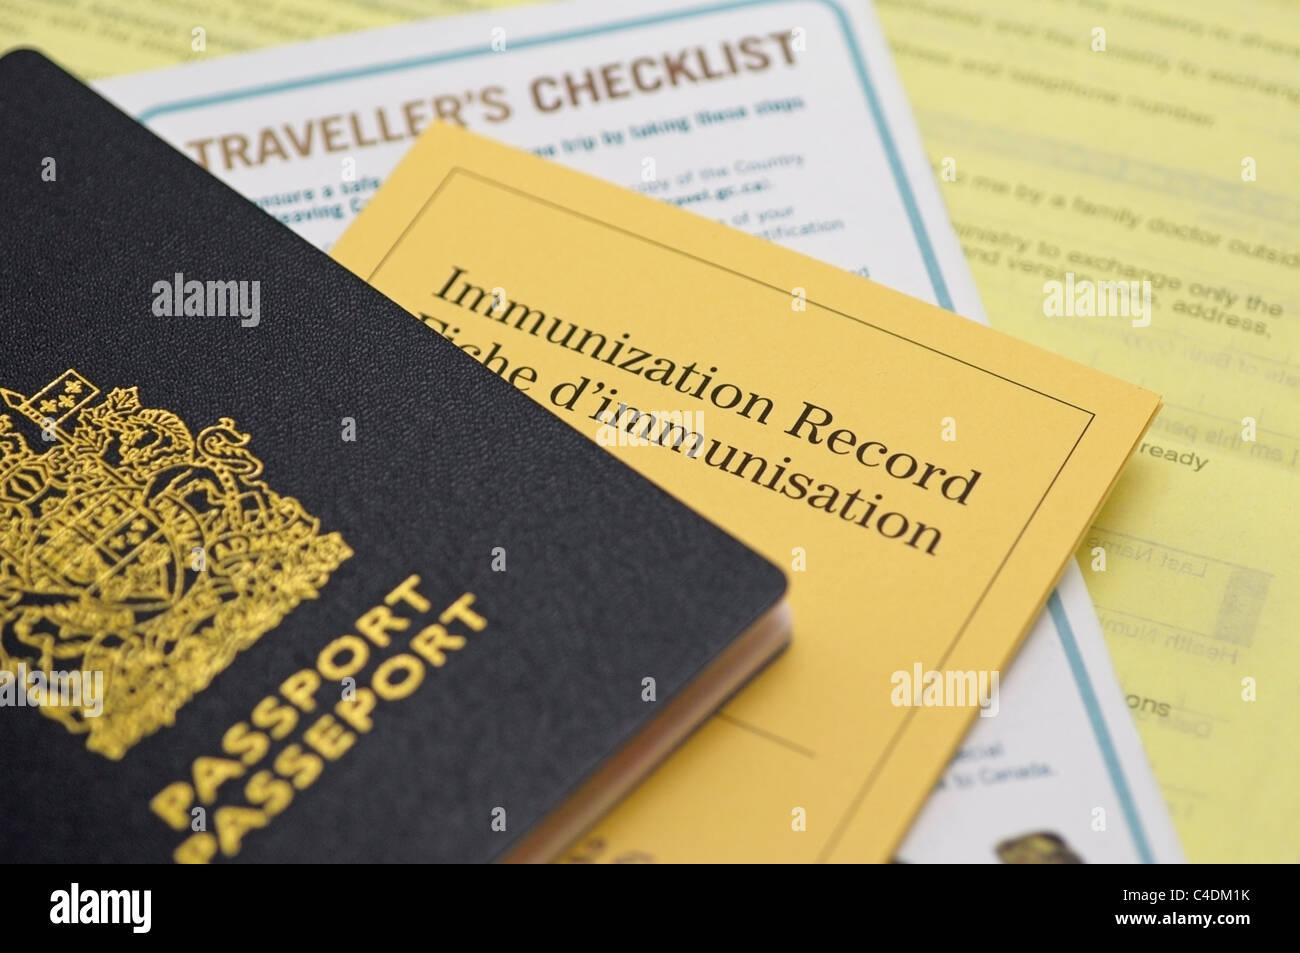 Passport, Immunization Record and Travel Checklist, Canadian - Stock Image